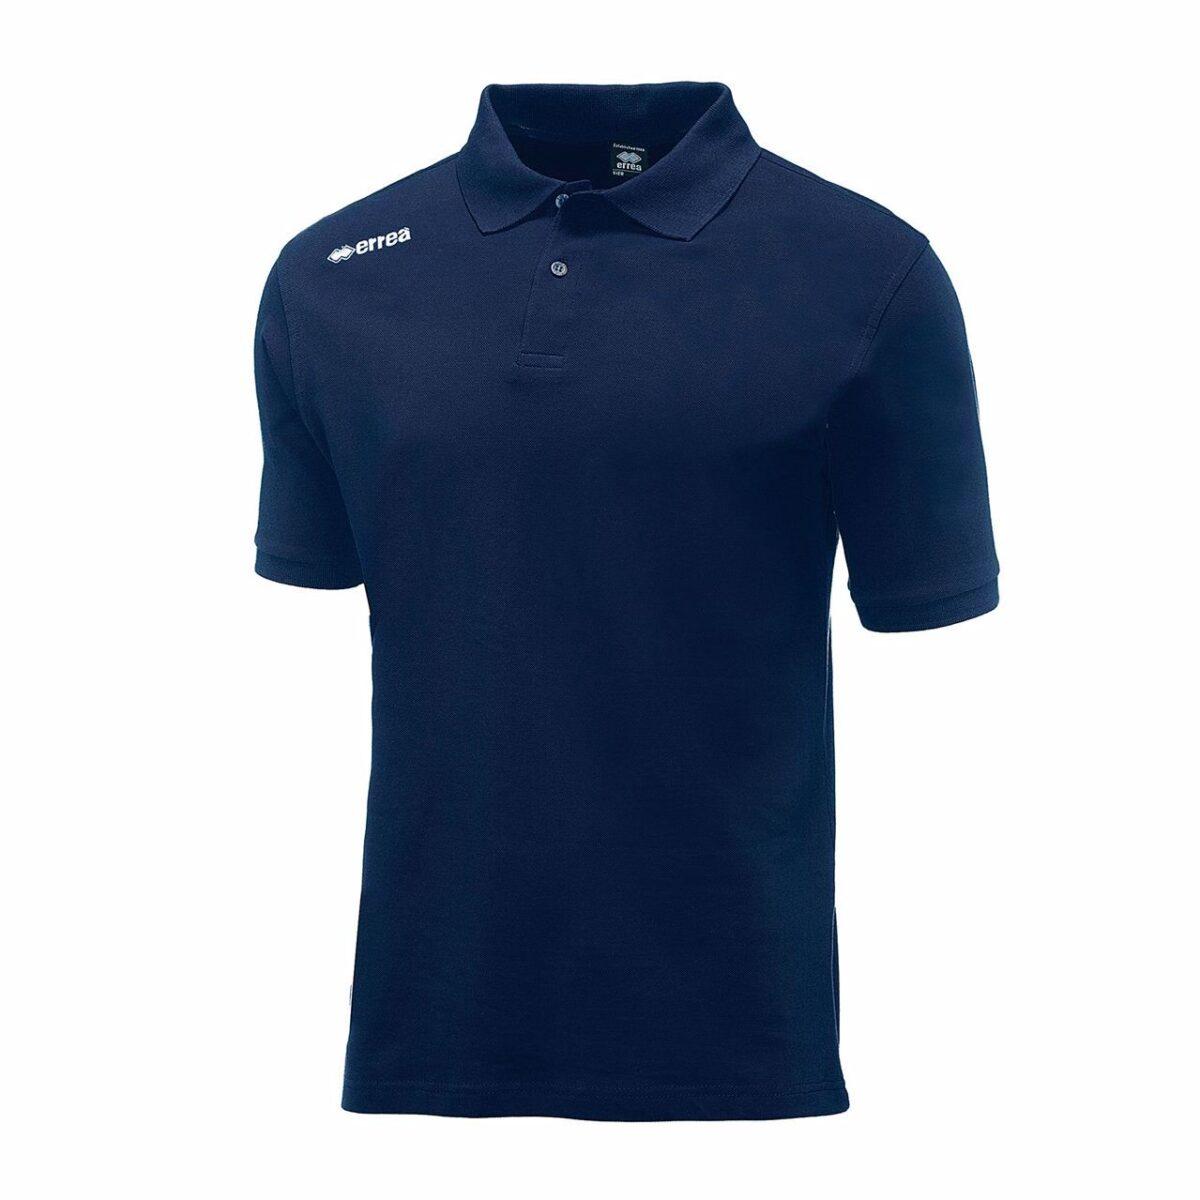 Errea Team Colours Polo Shirt D2100